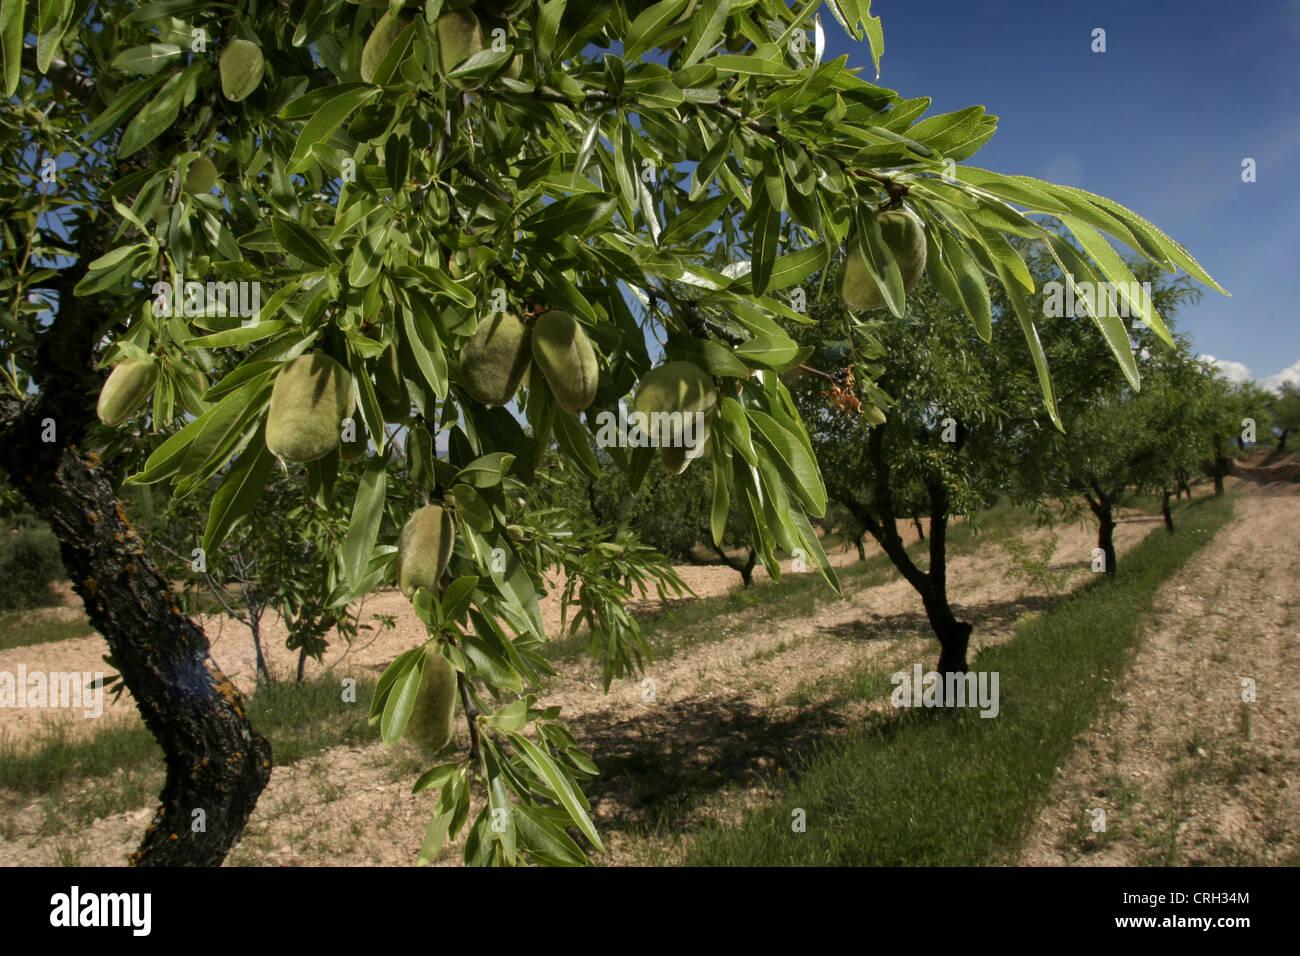 Photo: Steve Race - Llargueta amandes sur l'arbre, Catalunya, Espagne. Photo Stock